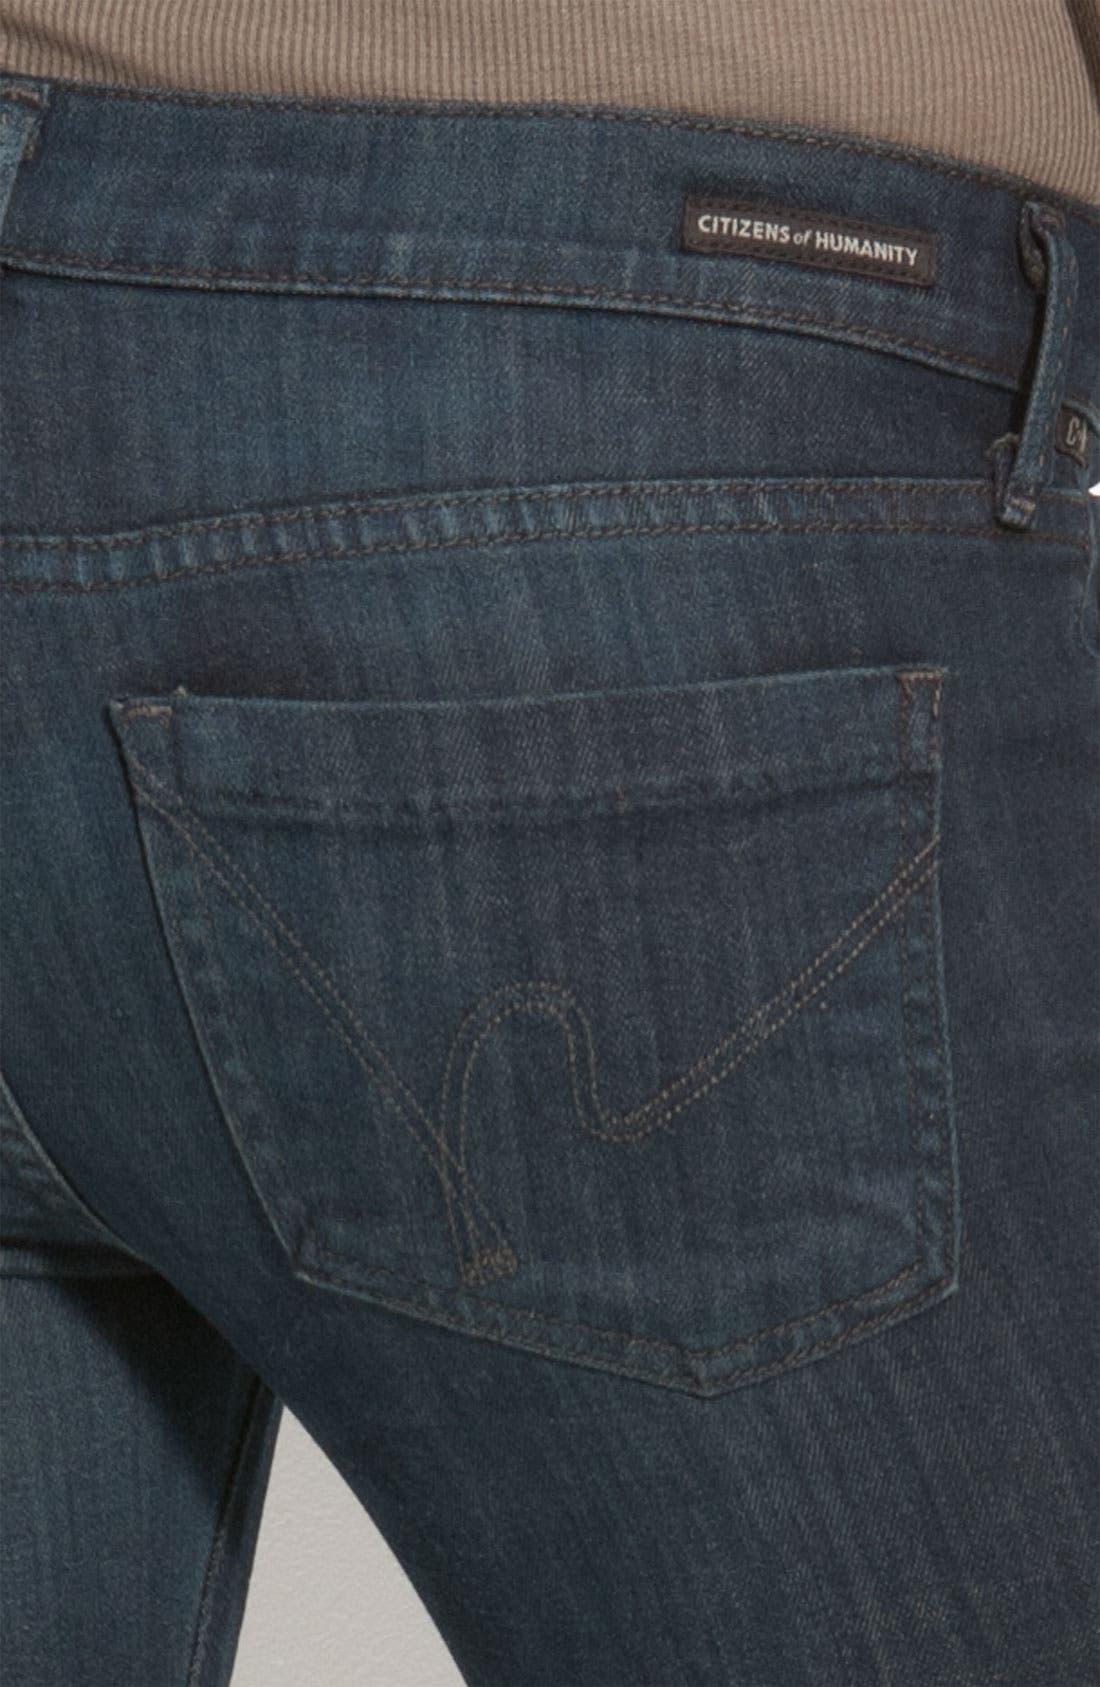 Alternate Image 3  - Citizens of Humanity 'Dita' Bootcut Jeans (Jupiter Wash) (Petite)